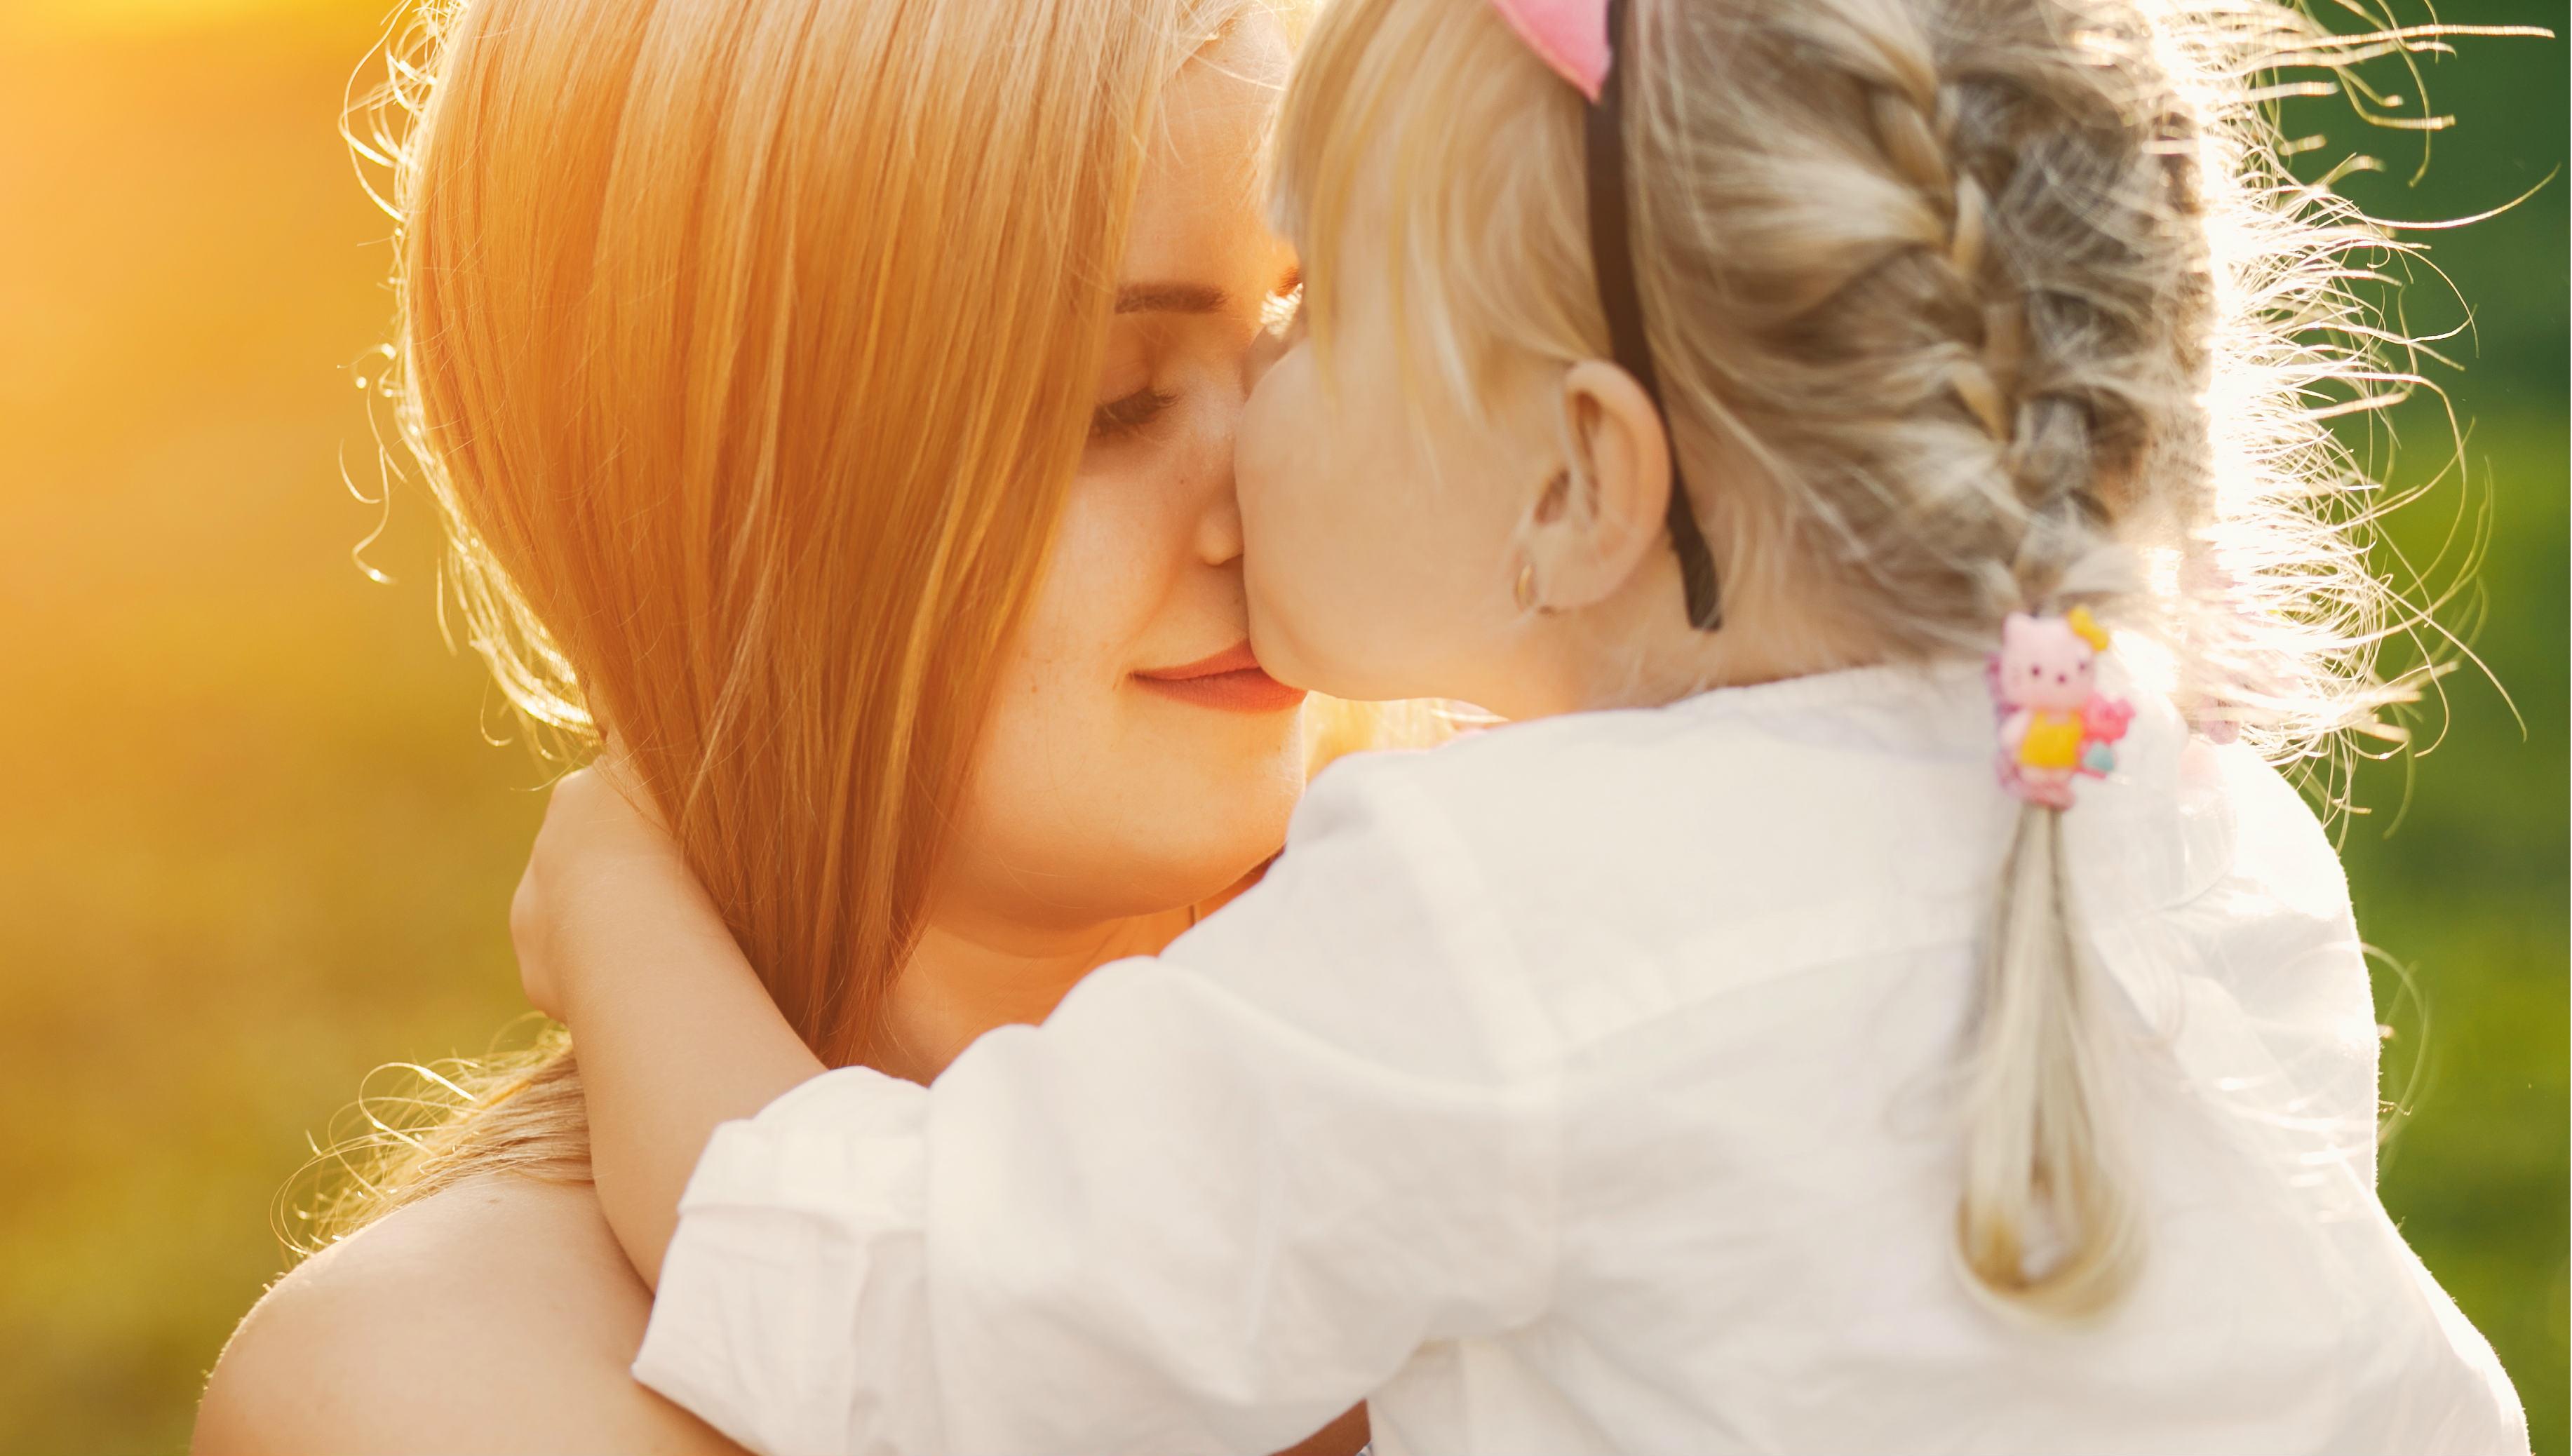 soin parent enfant - Designed by prostooleh / Freepik